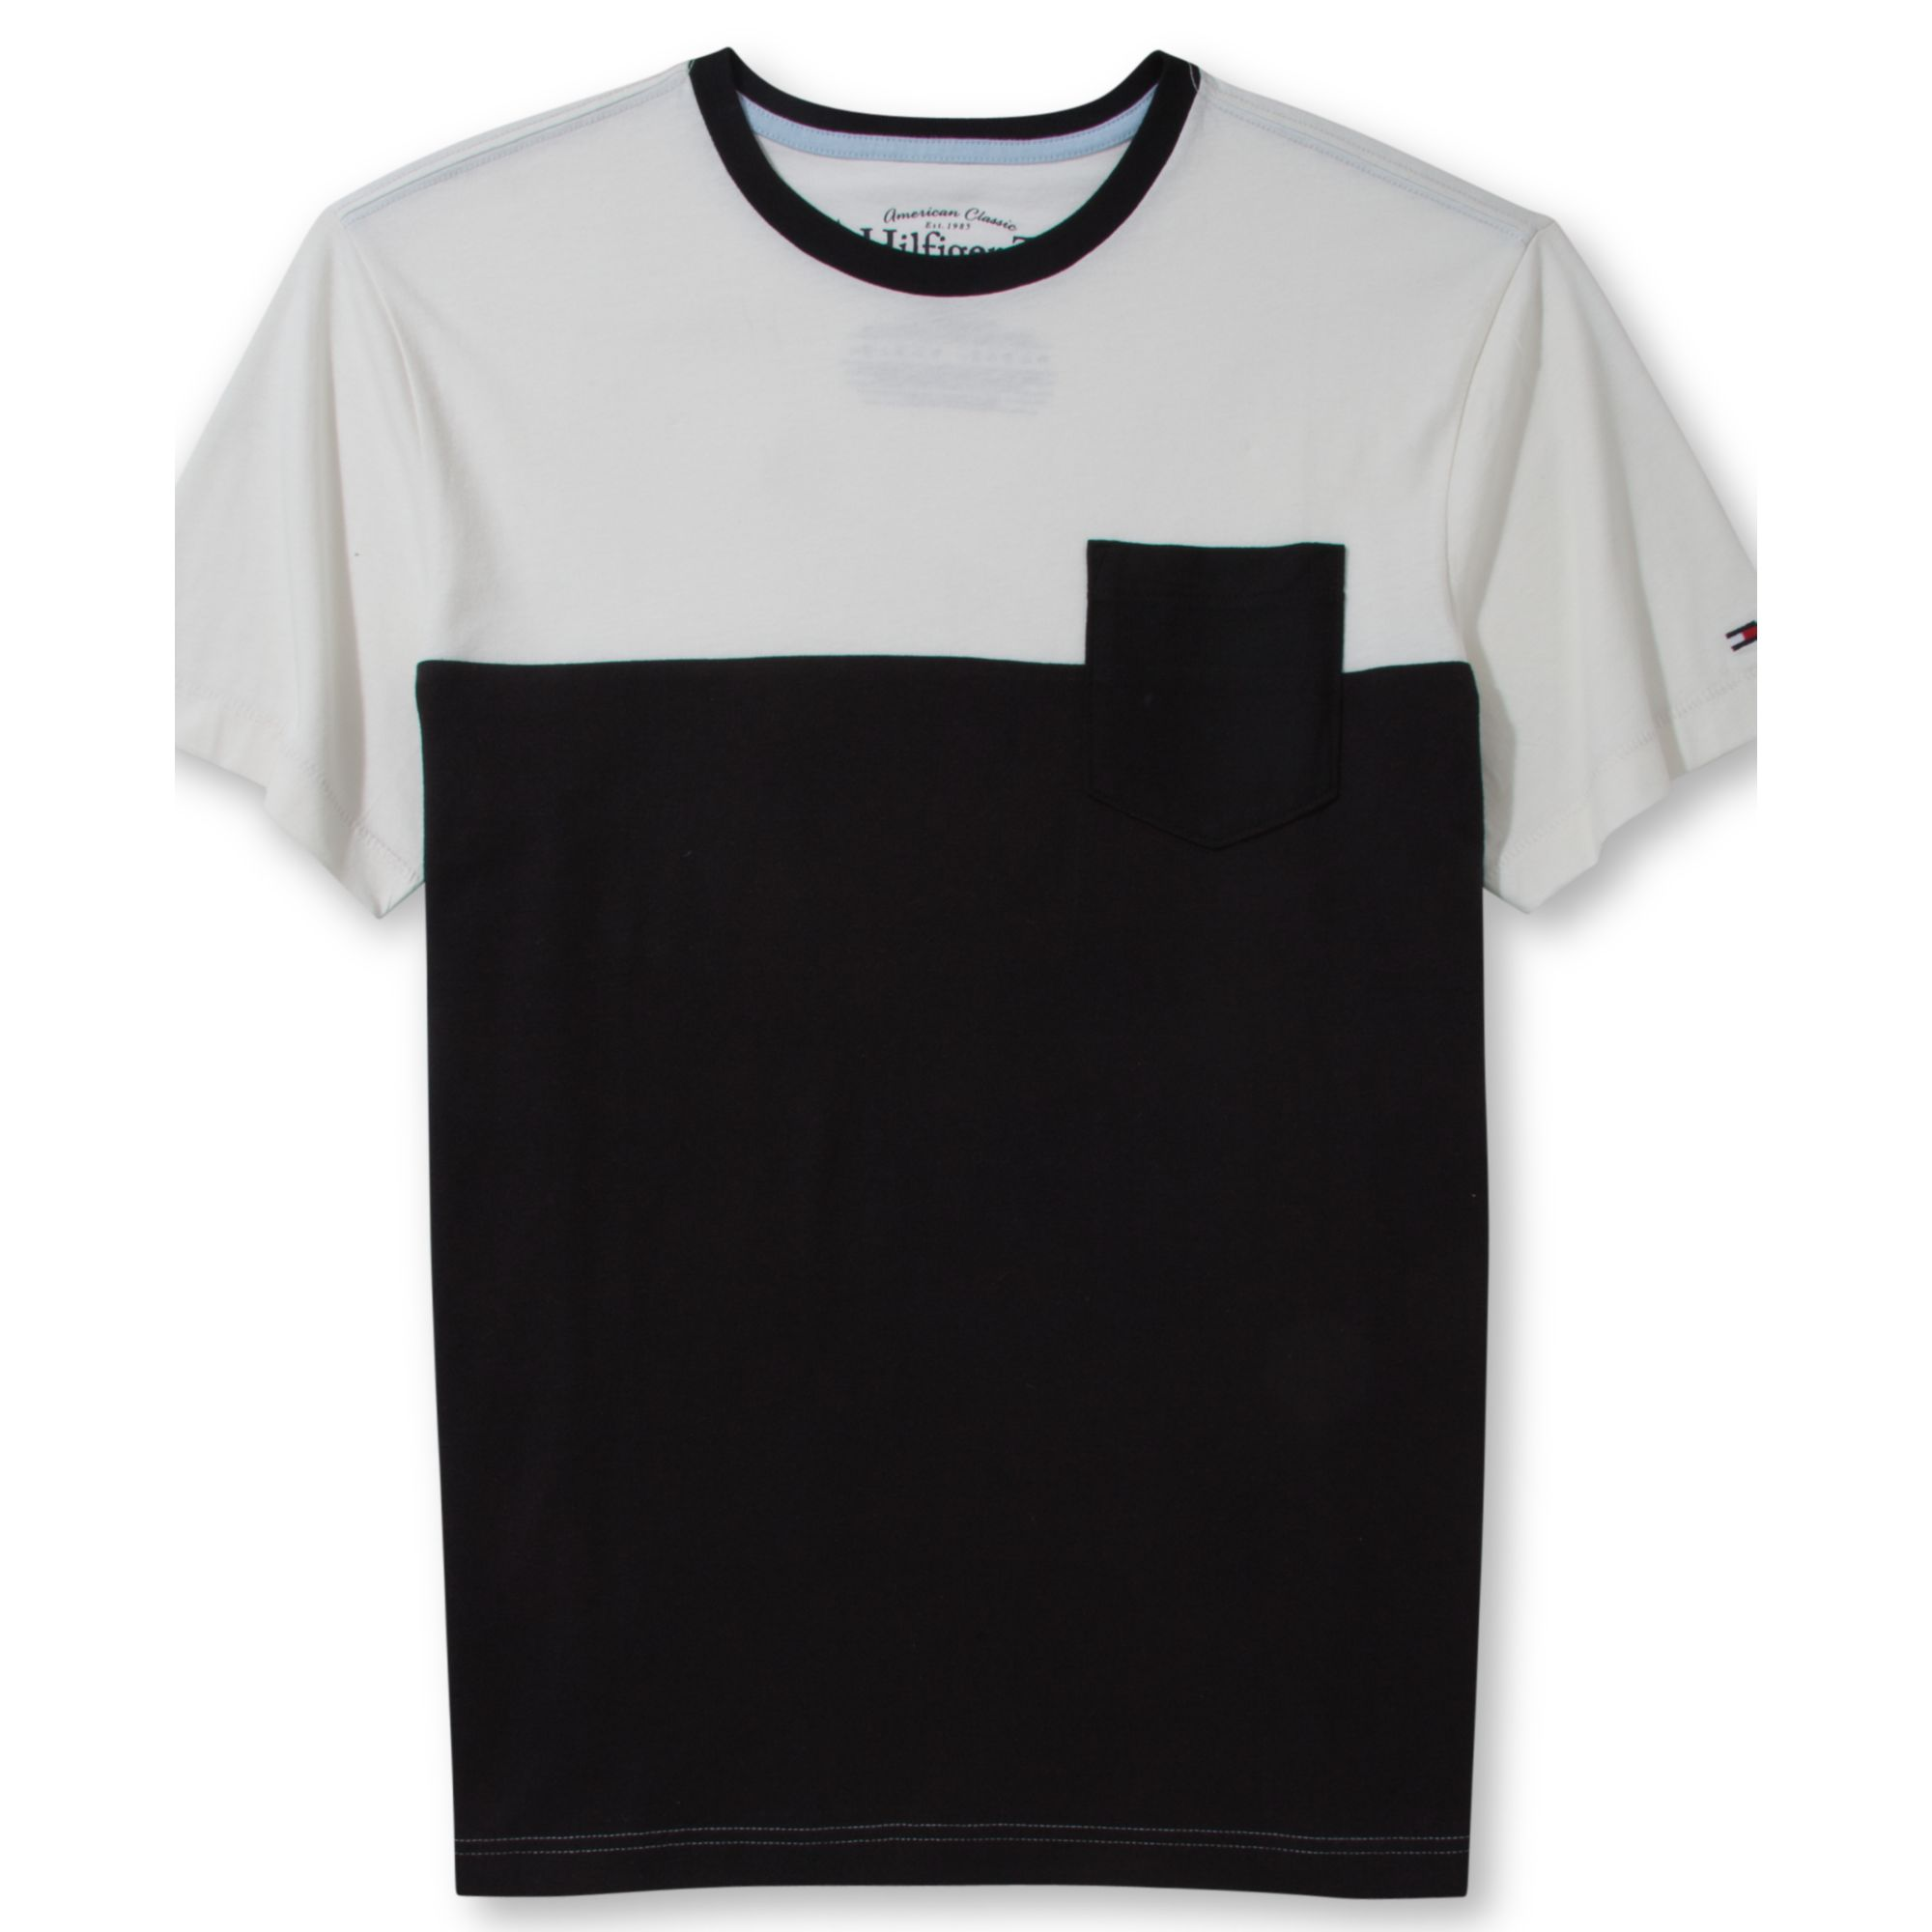 cb76adf5d51 Lyst - Tommy Hilfiger Black Kale Pocket Tshirt in White .